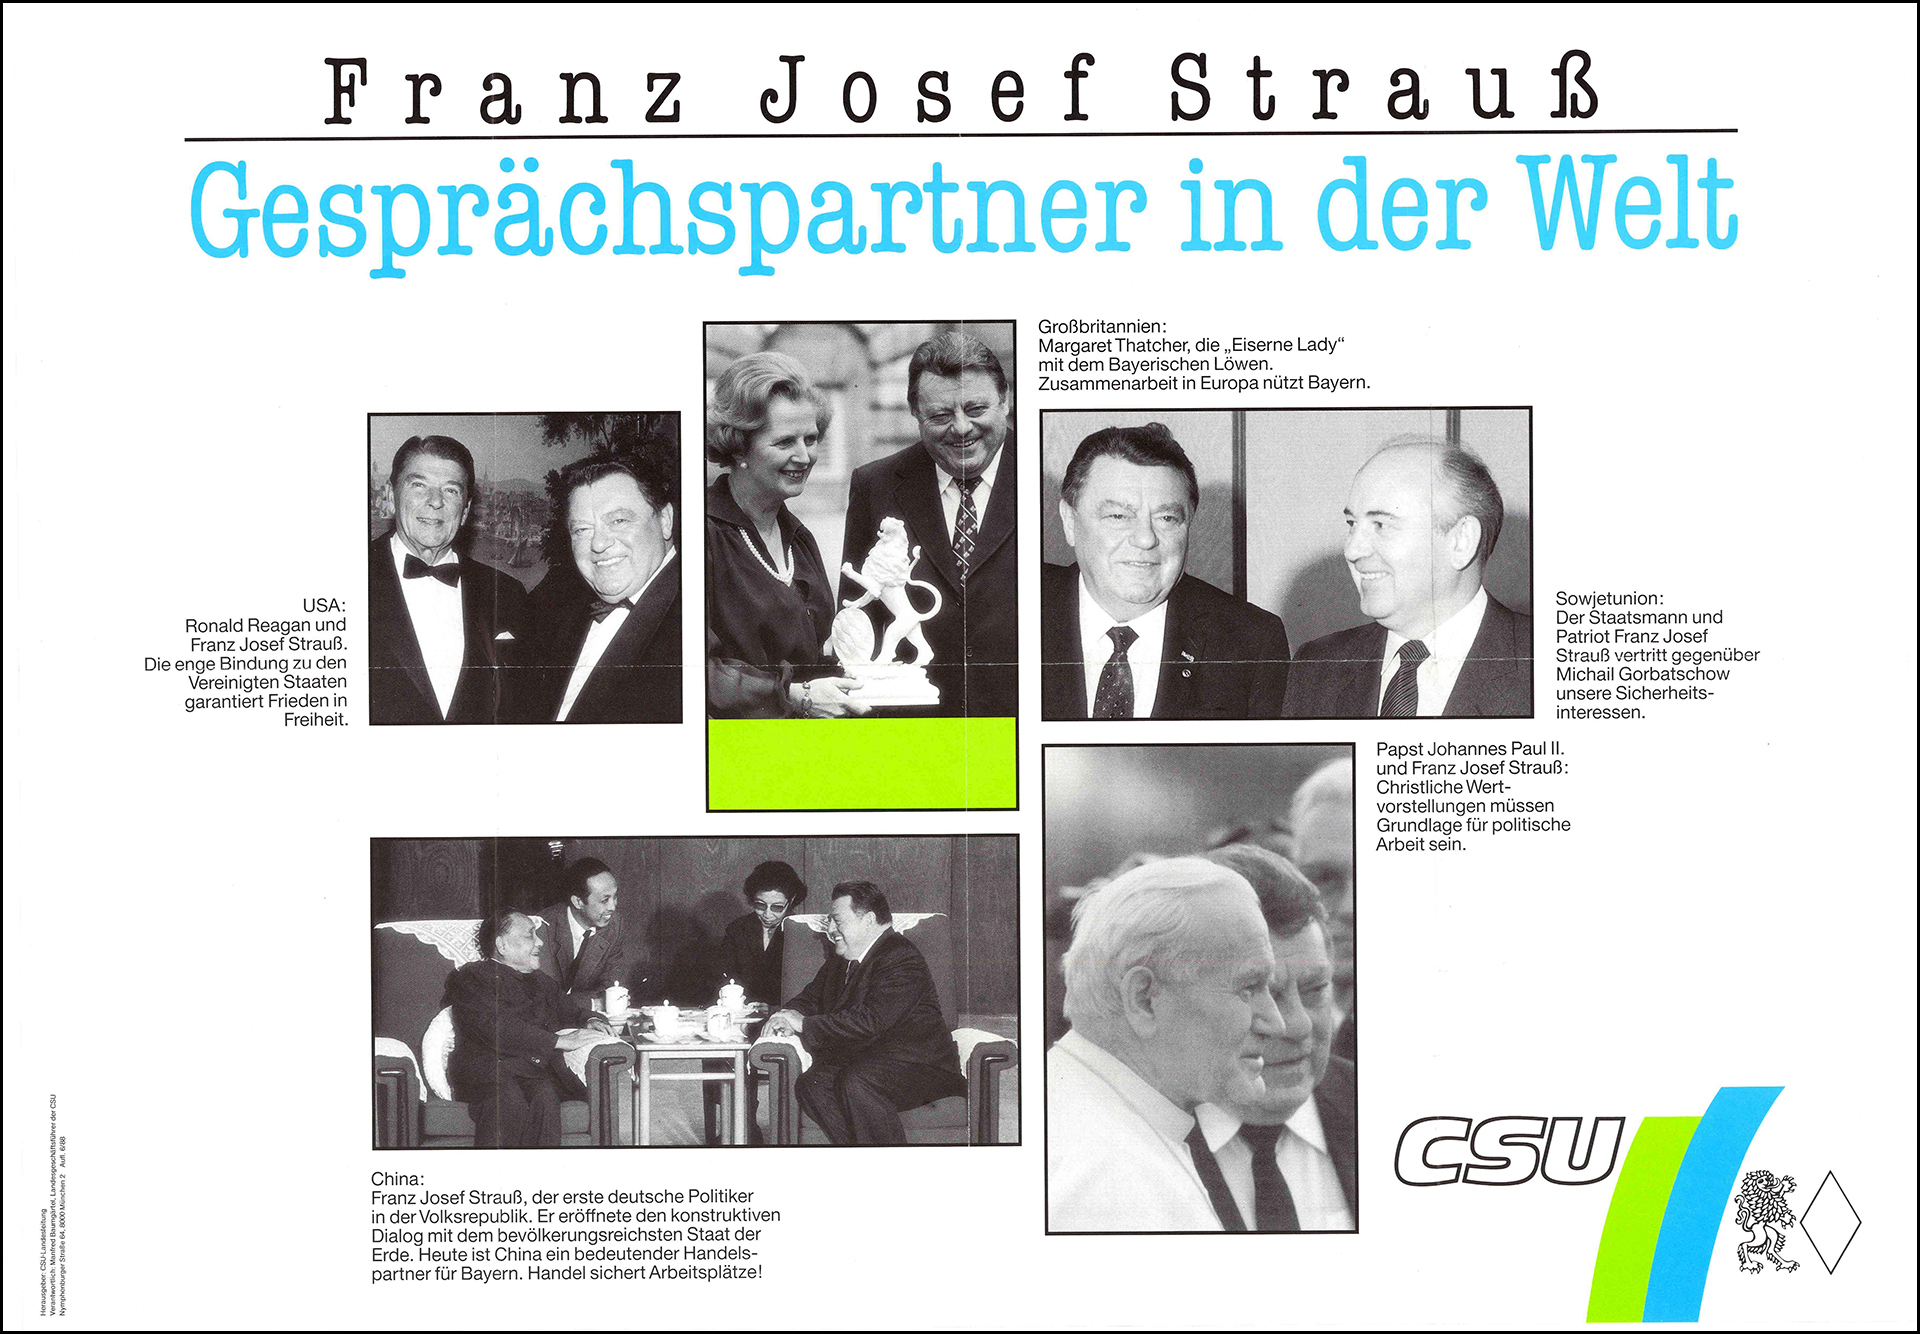 FJS mit Ronald Reagan, Margaret Thatcher, Michail Gorbatschow, Deng Xiaoping und Papst Johannes Paul II.